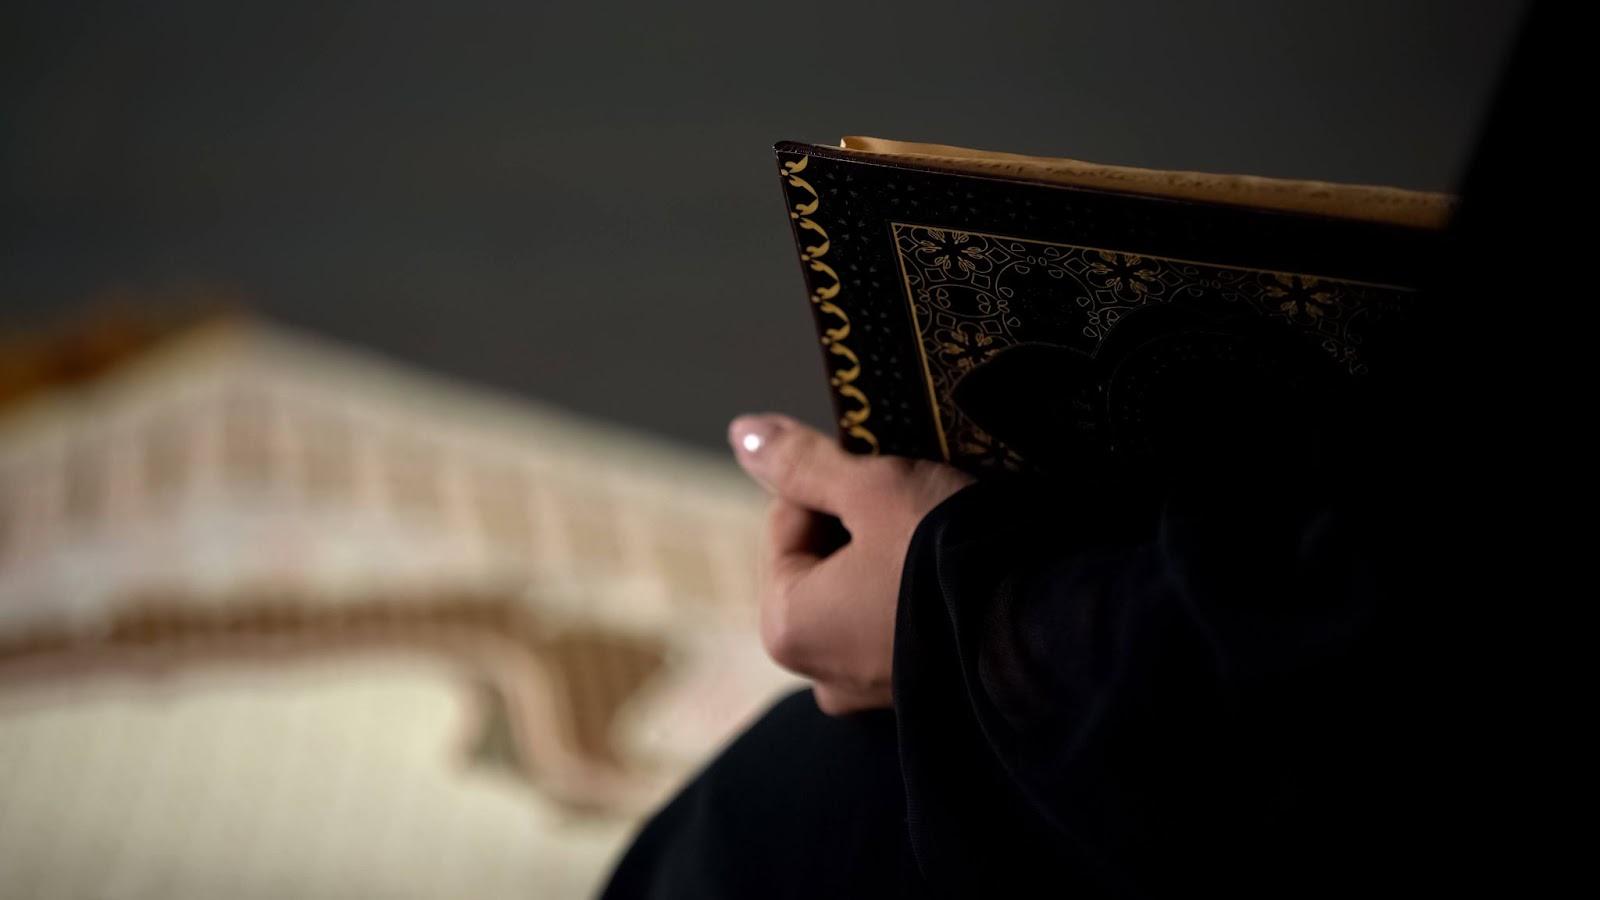 Quran, research, fiqh, understanding